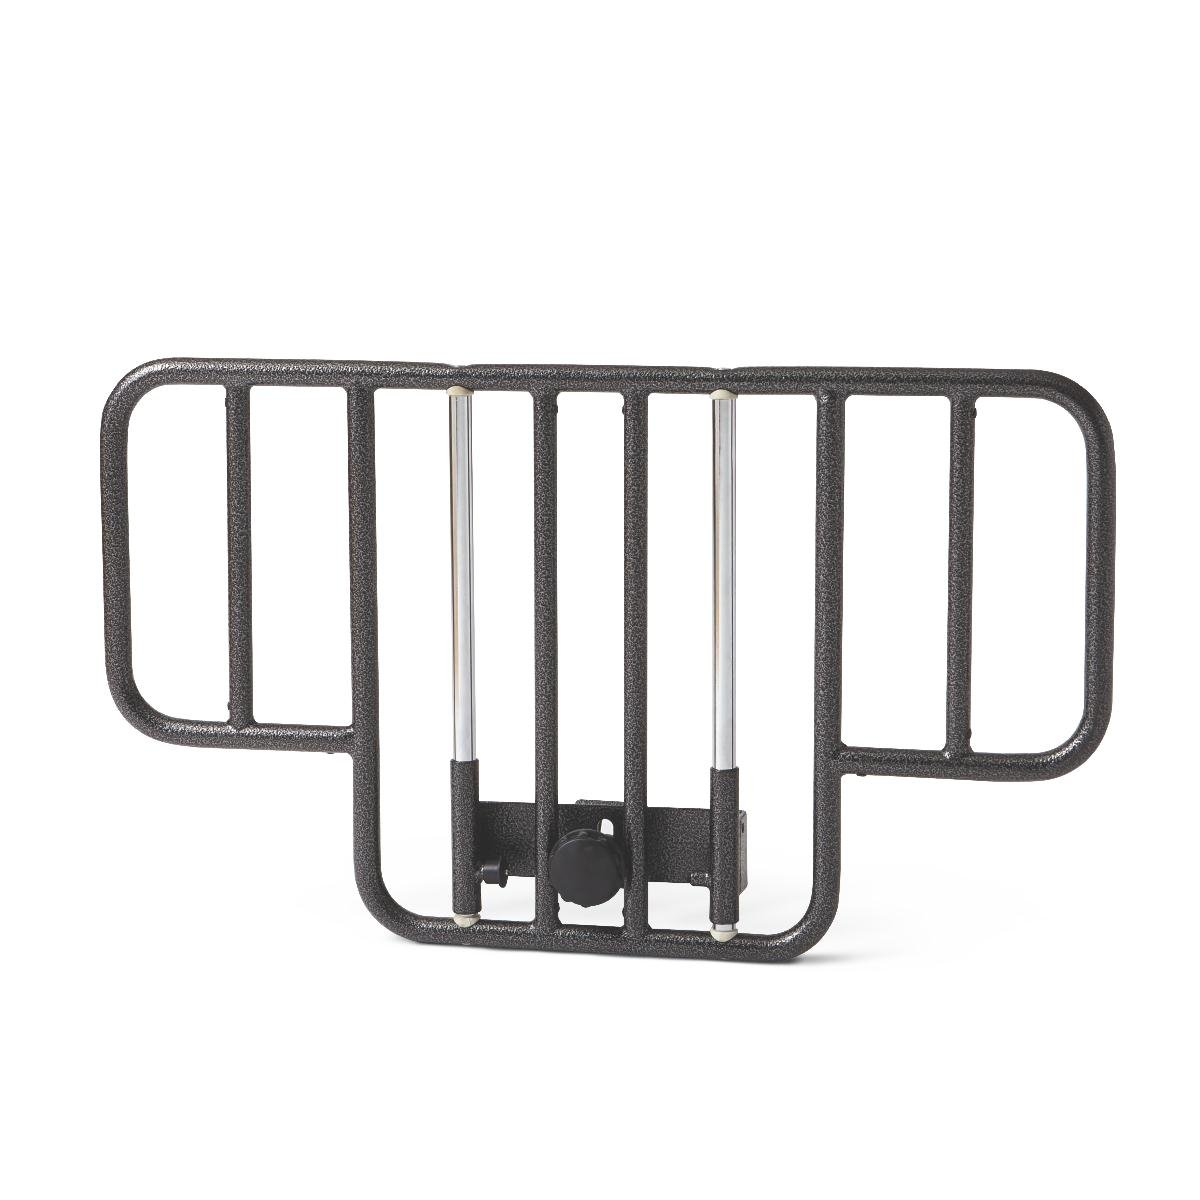 Medline Universal Half Bed Rails